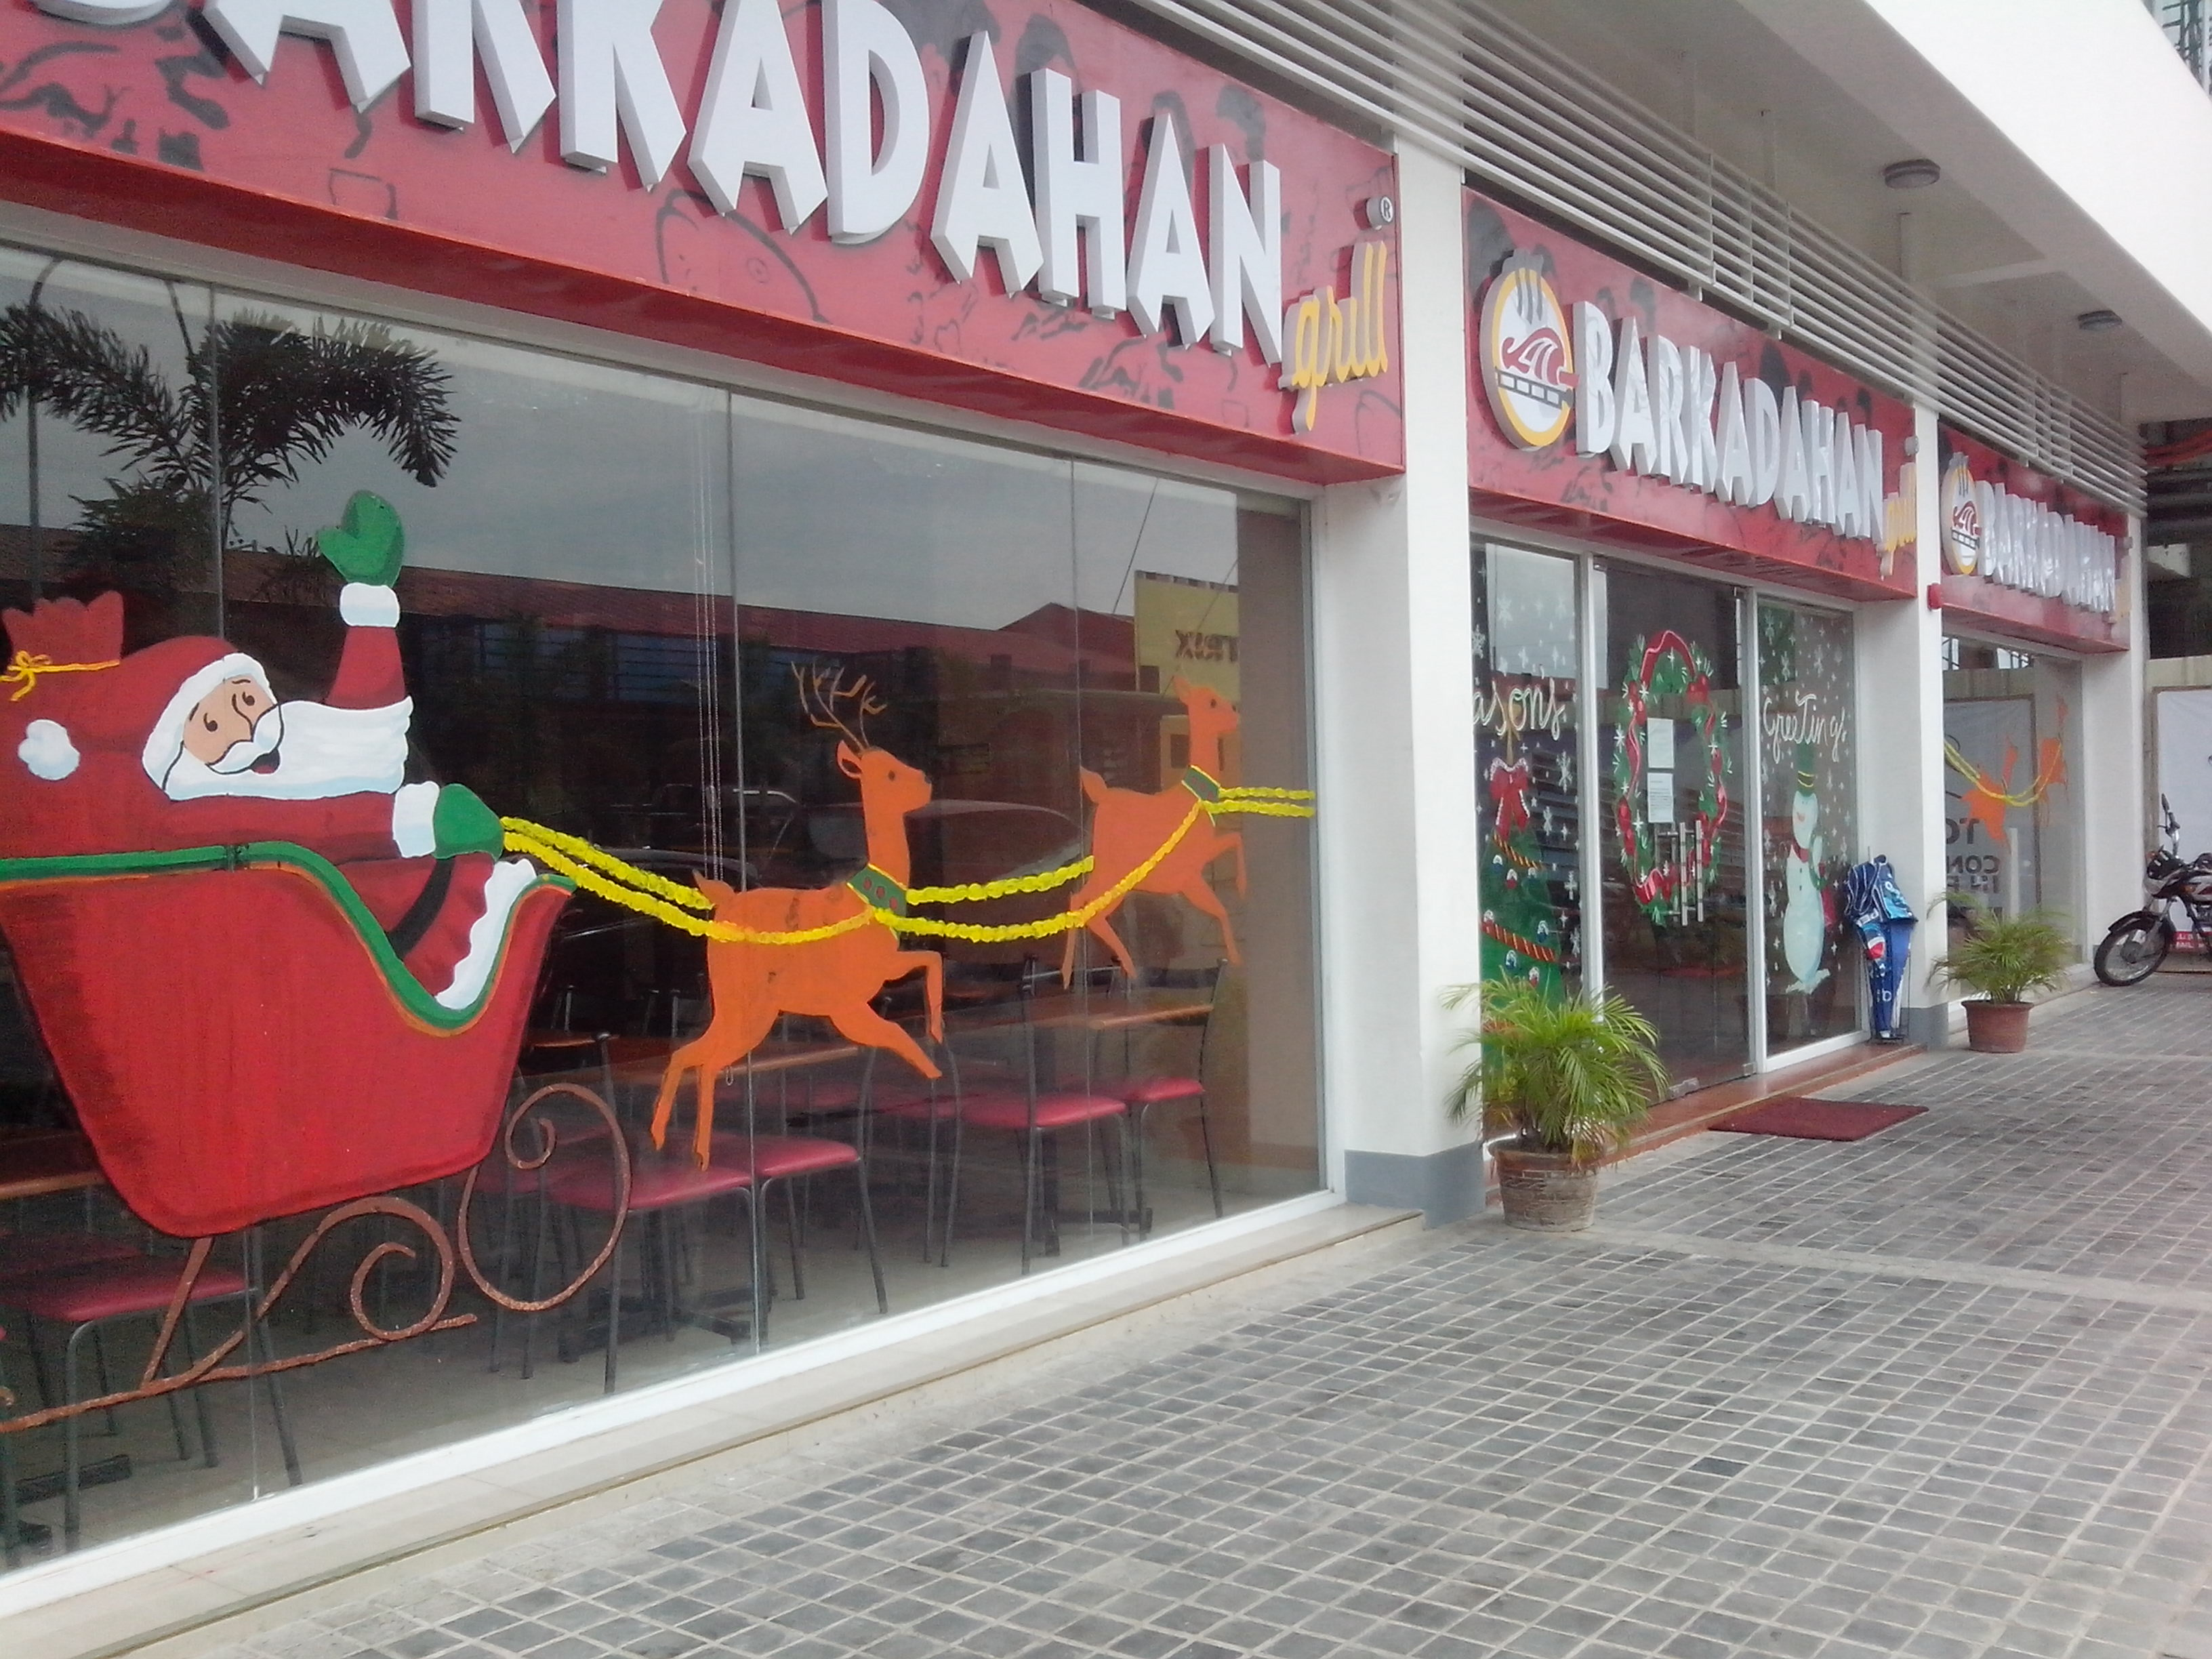 Barkadahan Restaurant | Primavera Residences | Uptown Cagayan de Oro